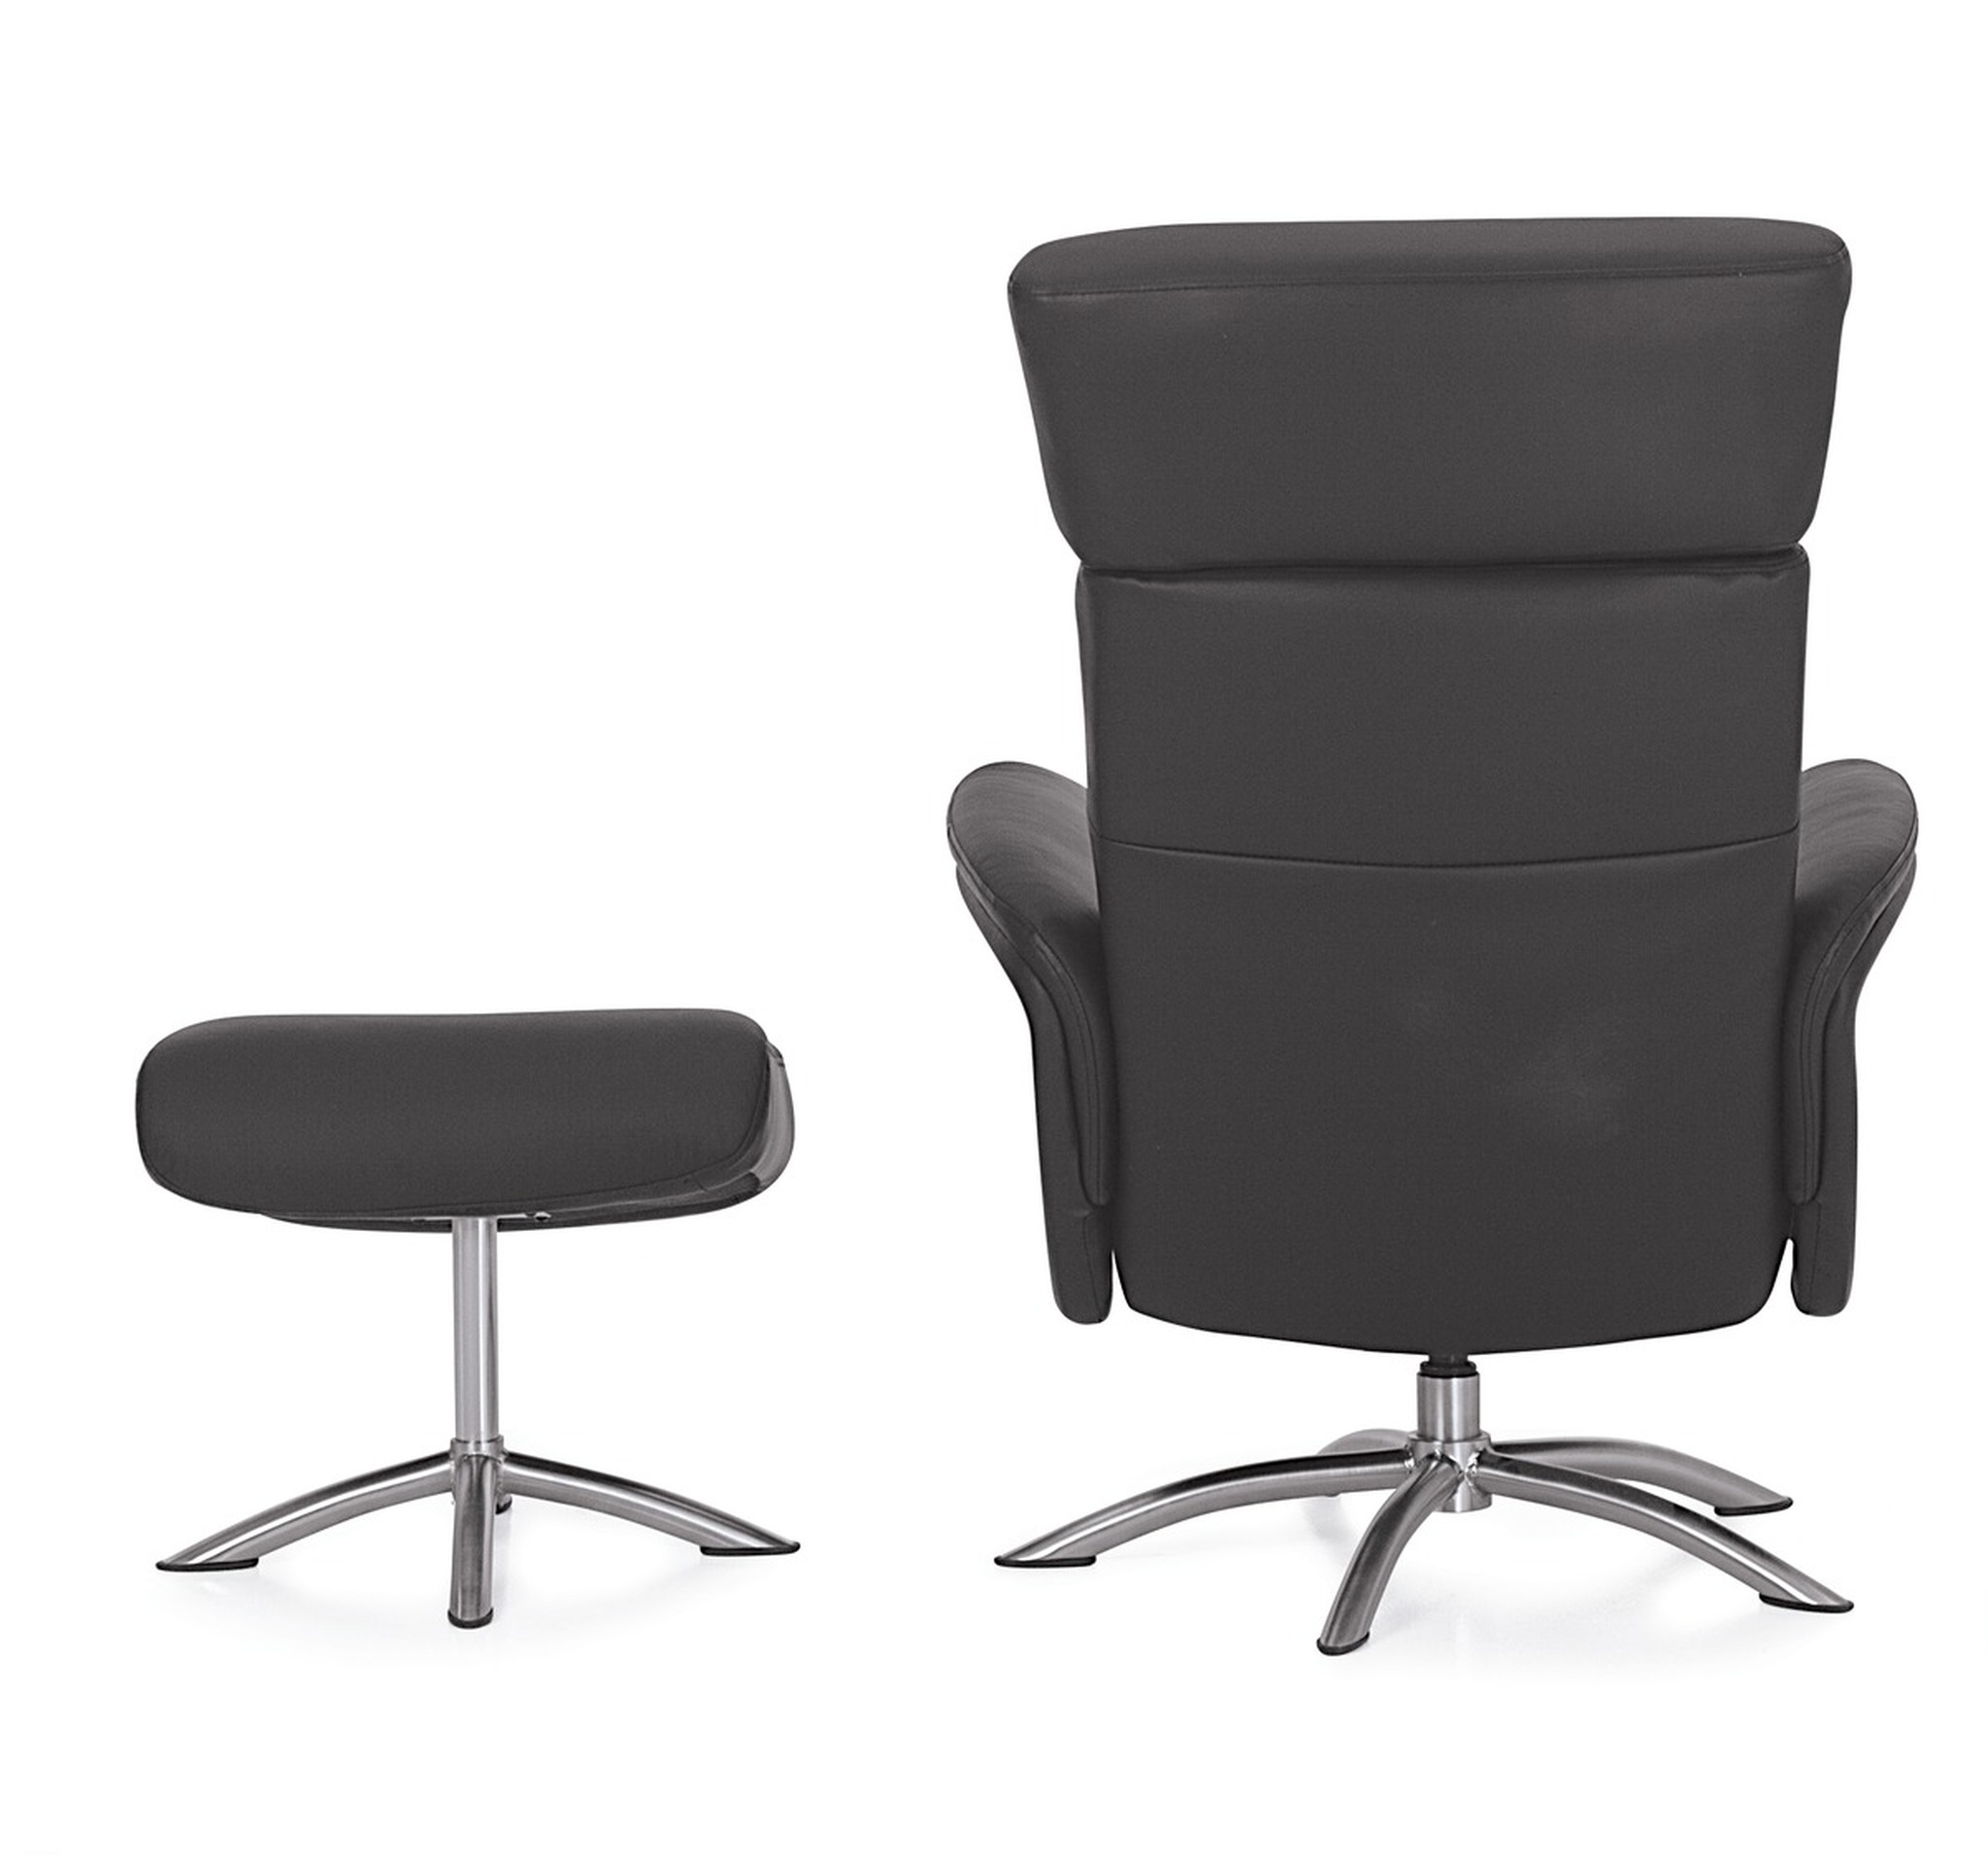 euro recliner chair santa for sale palliser leather model 50004 q04